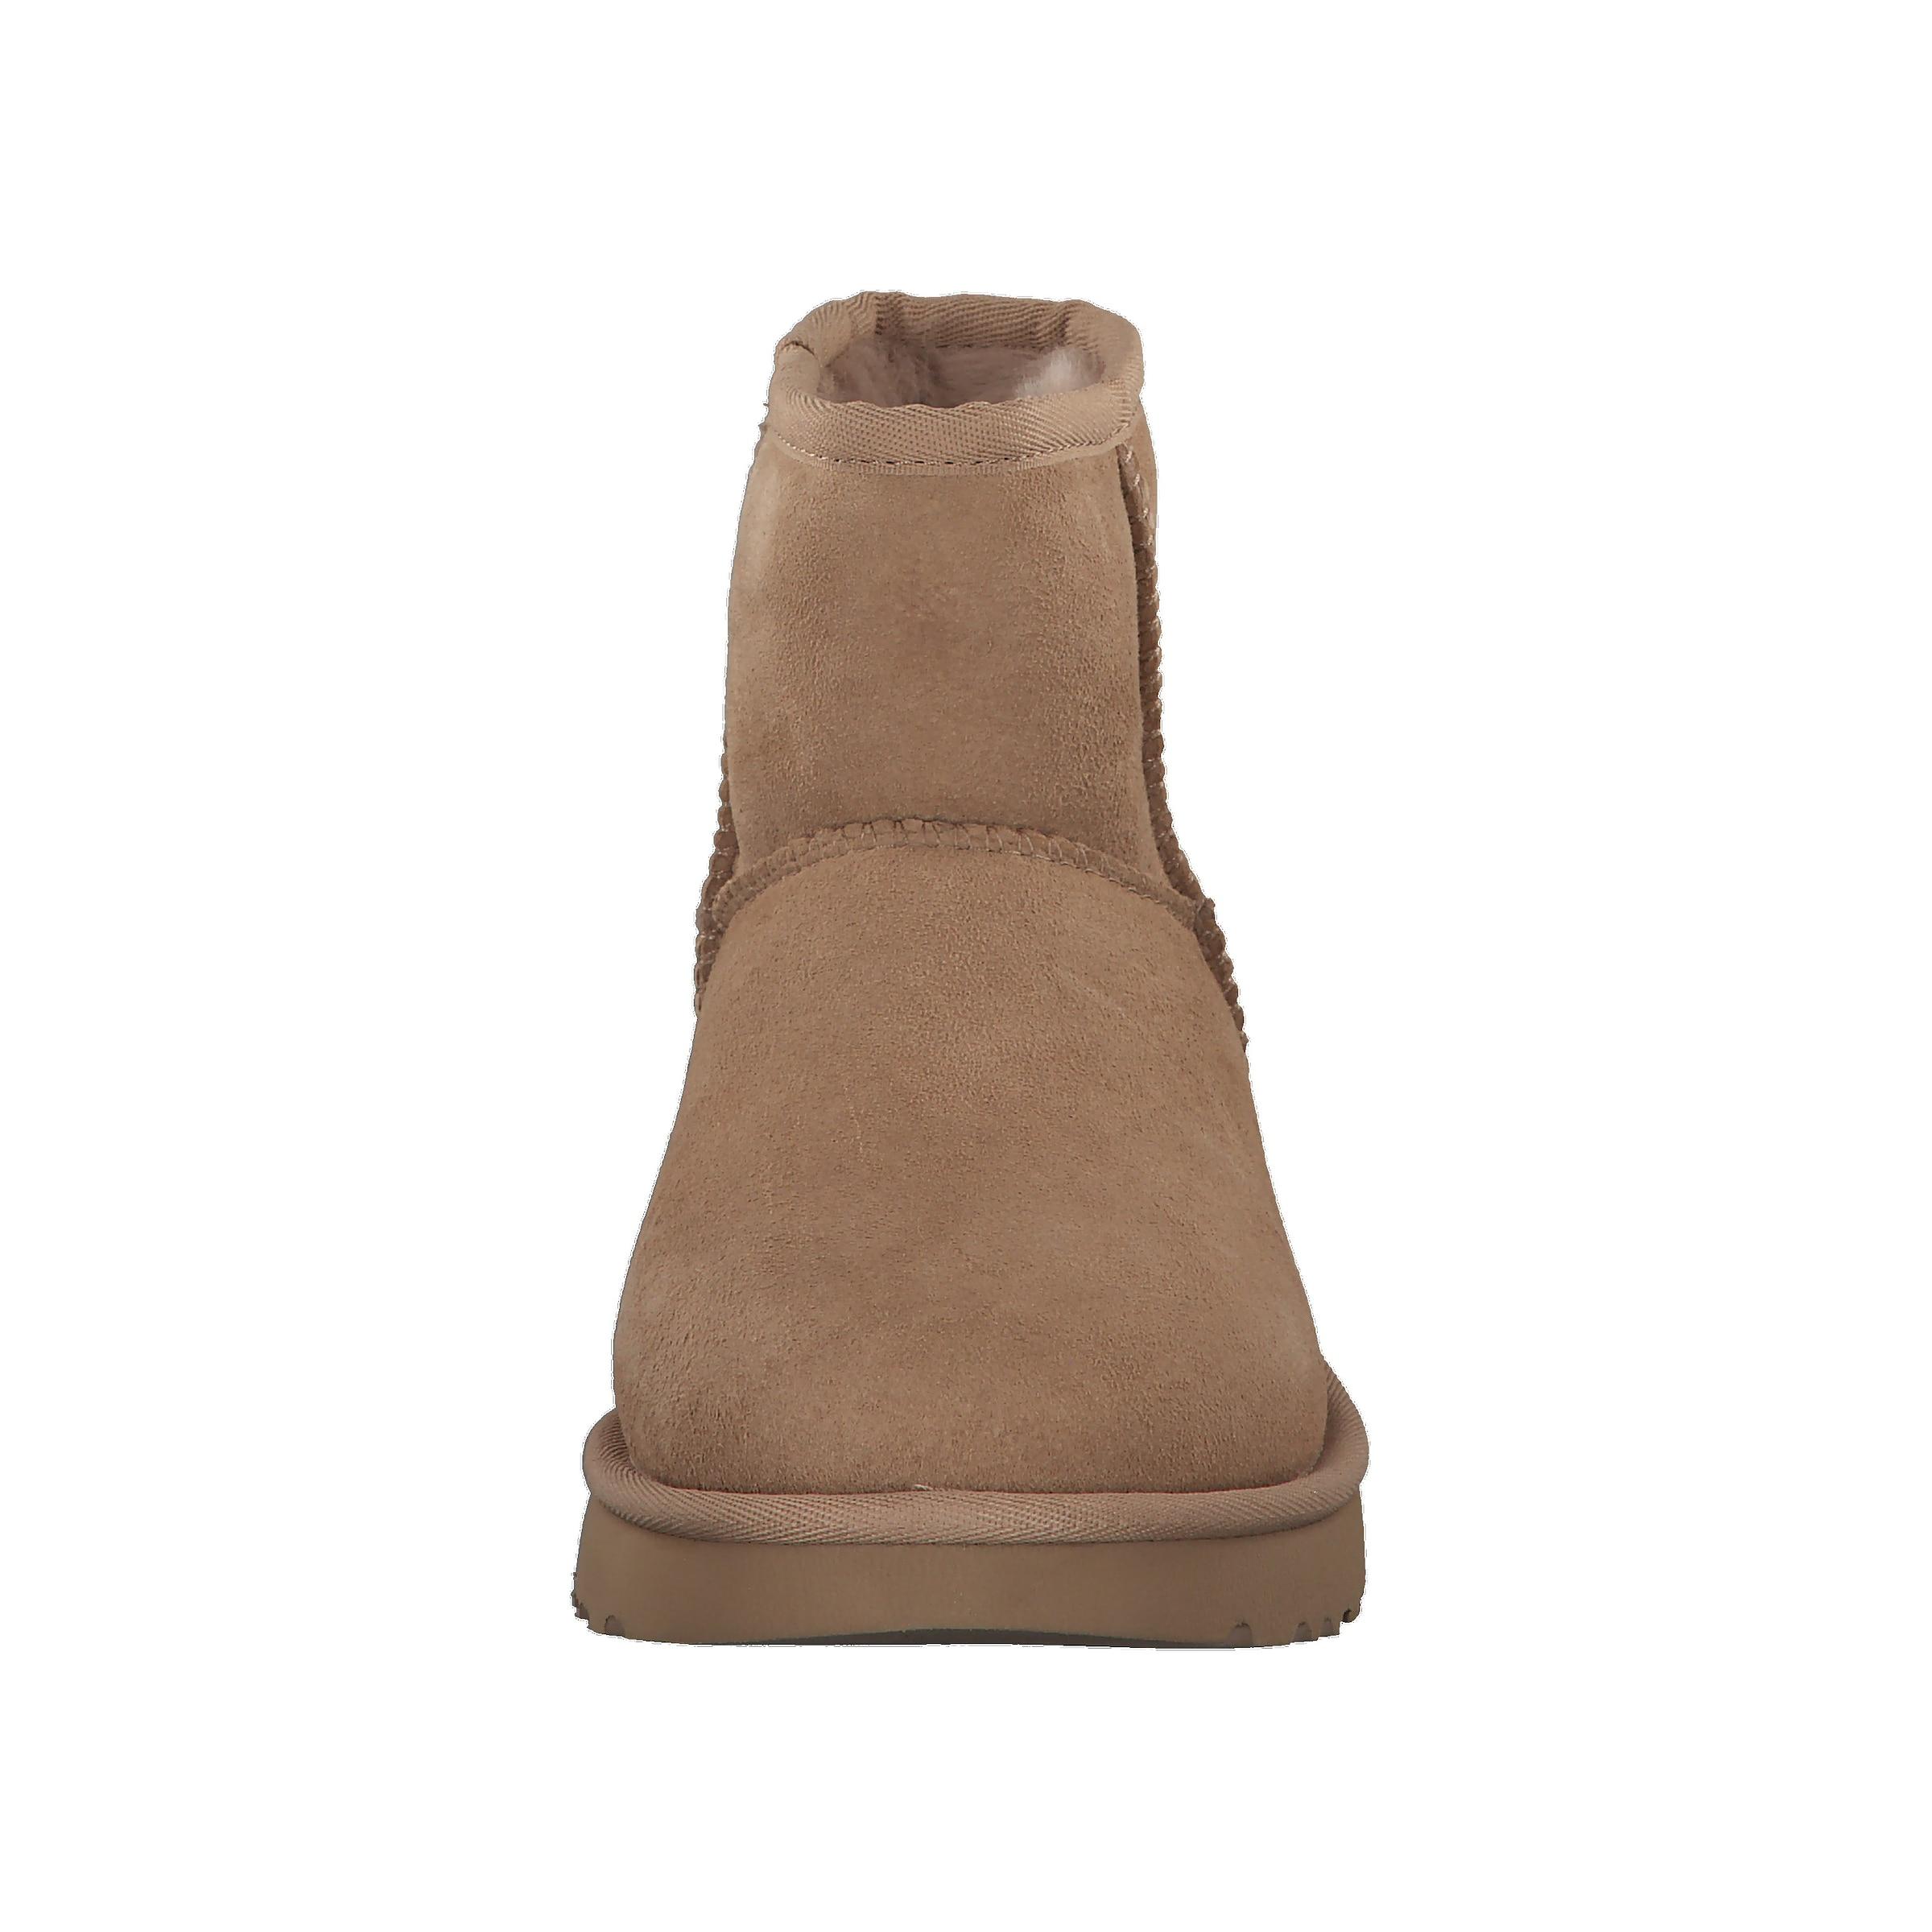 Ugg En 'classic MarronCaramel Ii' Boots Mini 6fvYyb7g